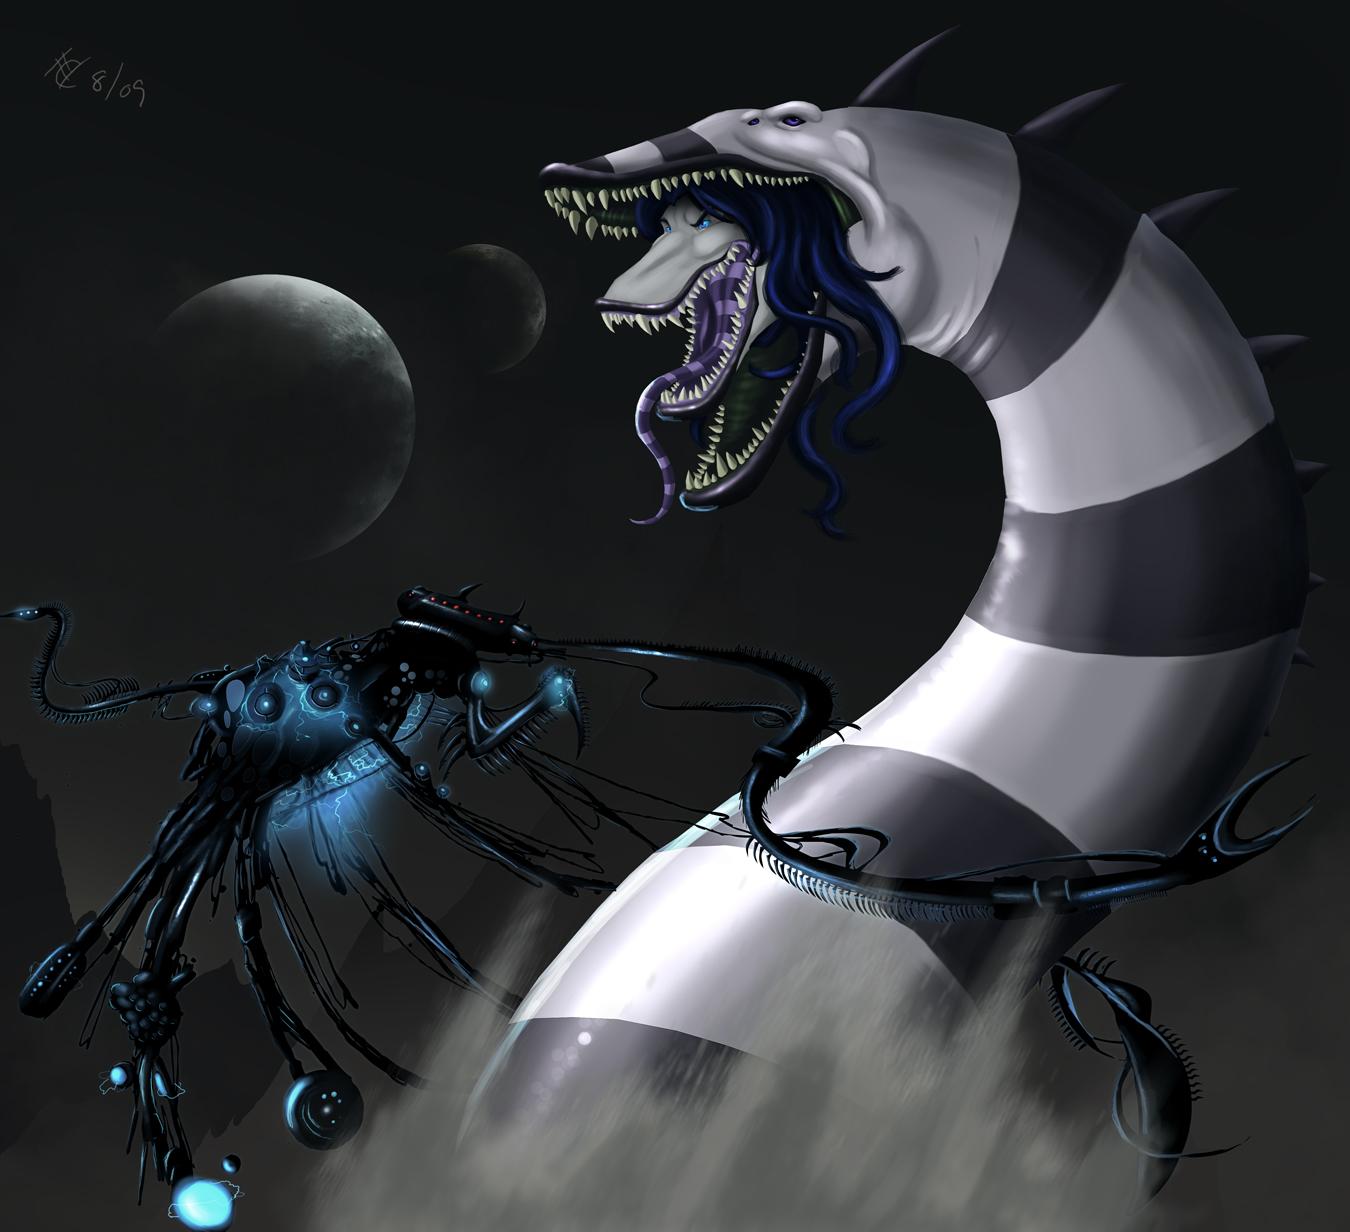 The Sandworm by Ghostwalker2061 on DeviantArt